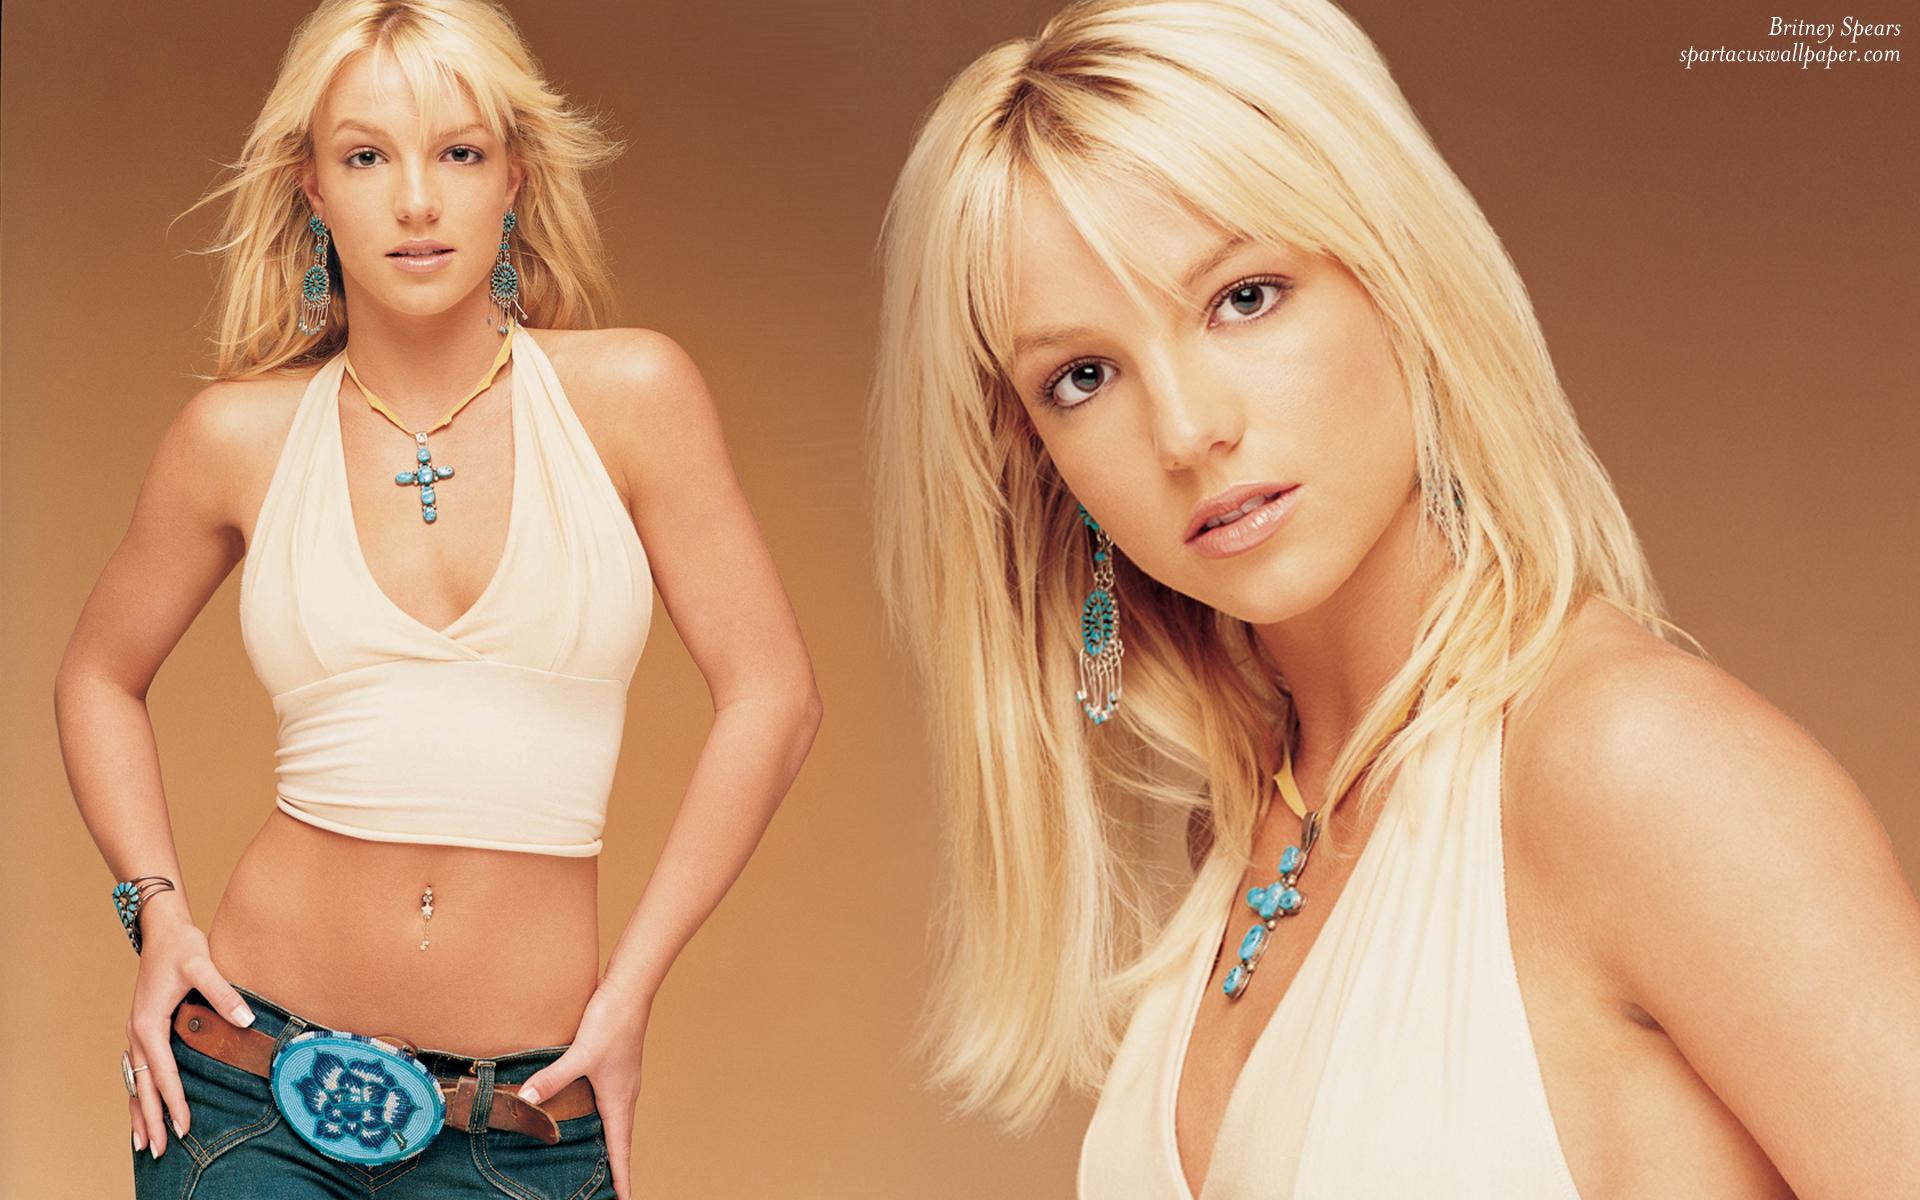 Britney Spears XIV